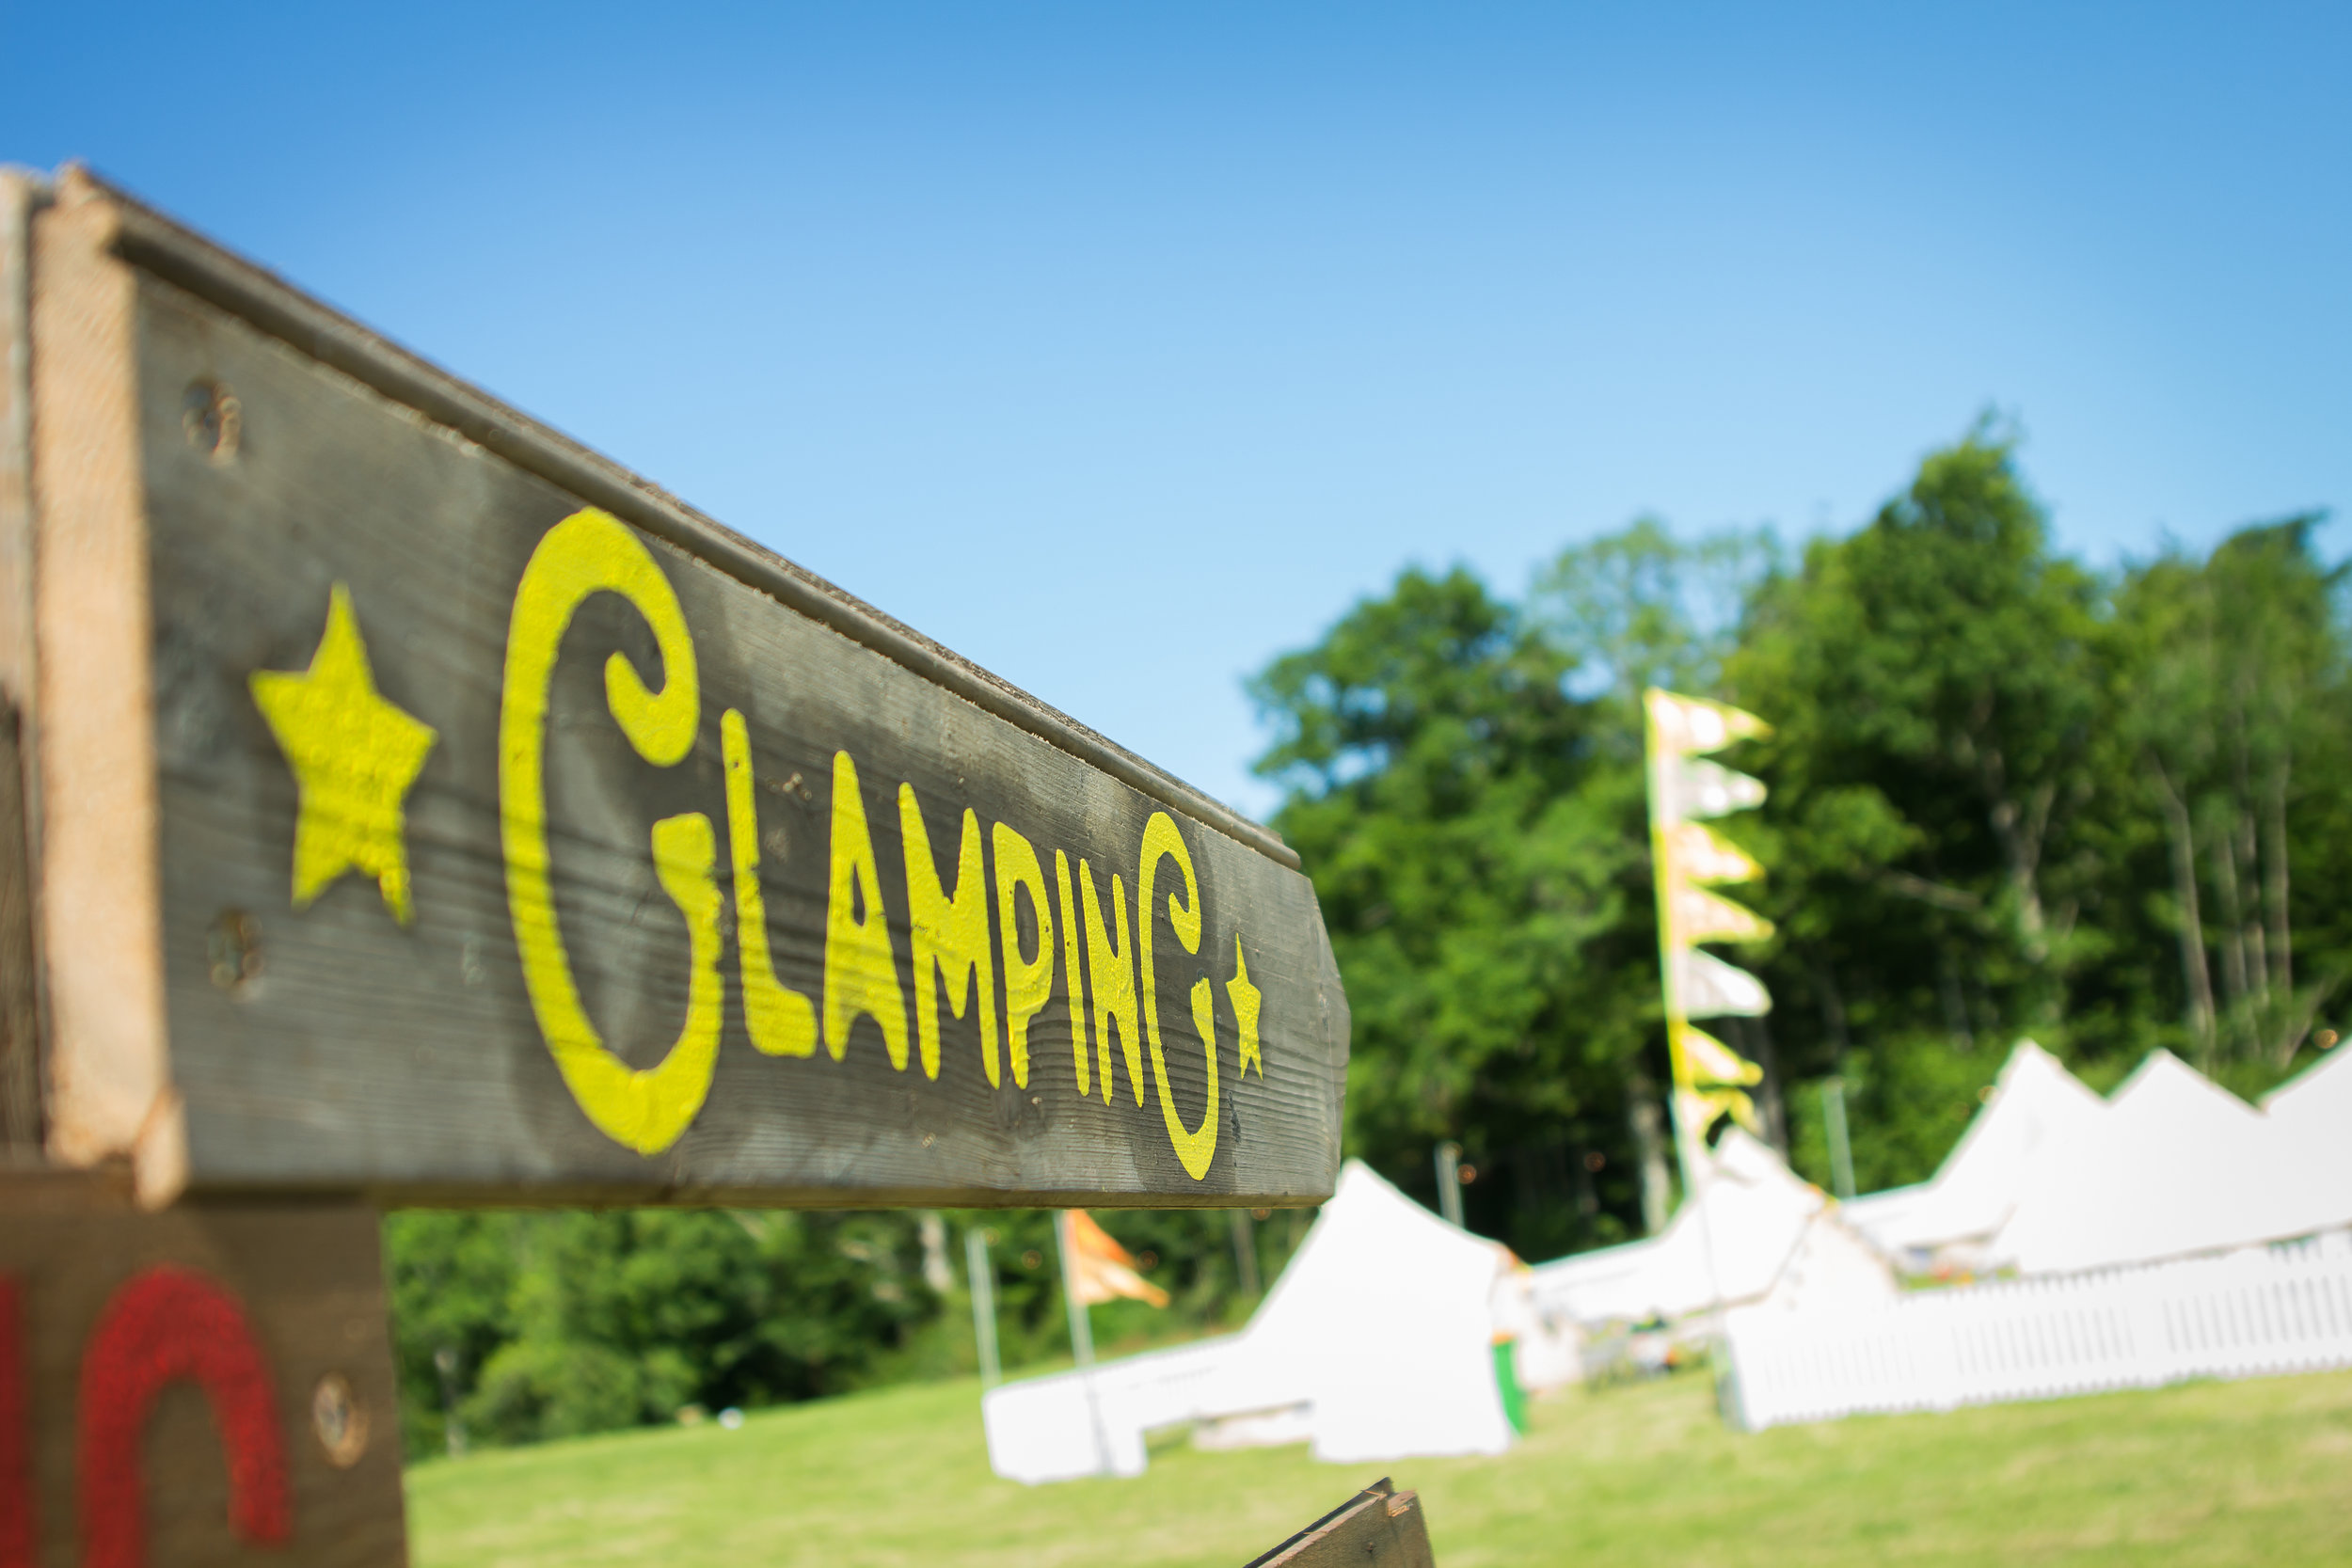 Glamping sign post.jpg